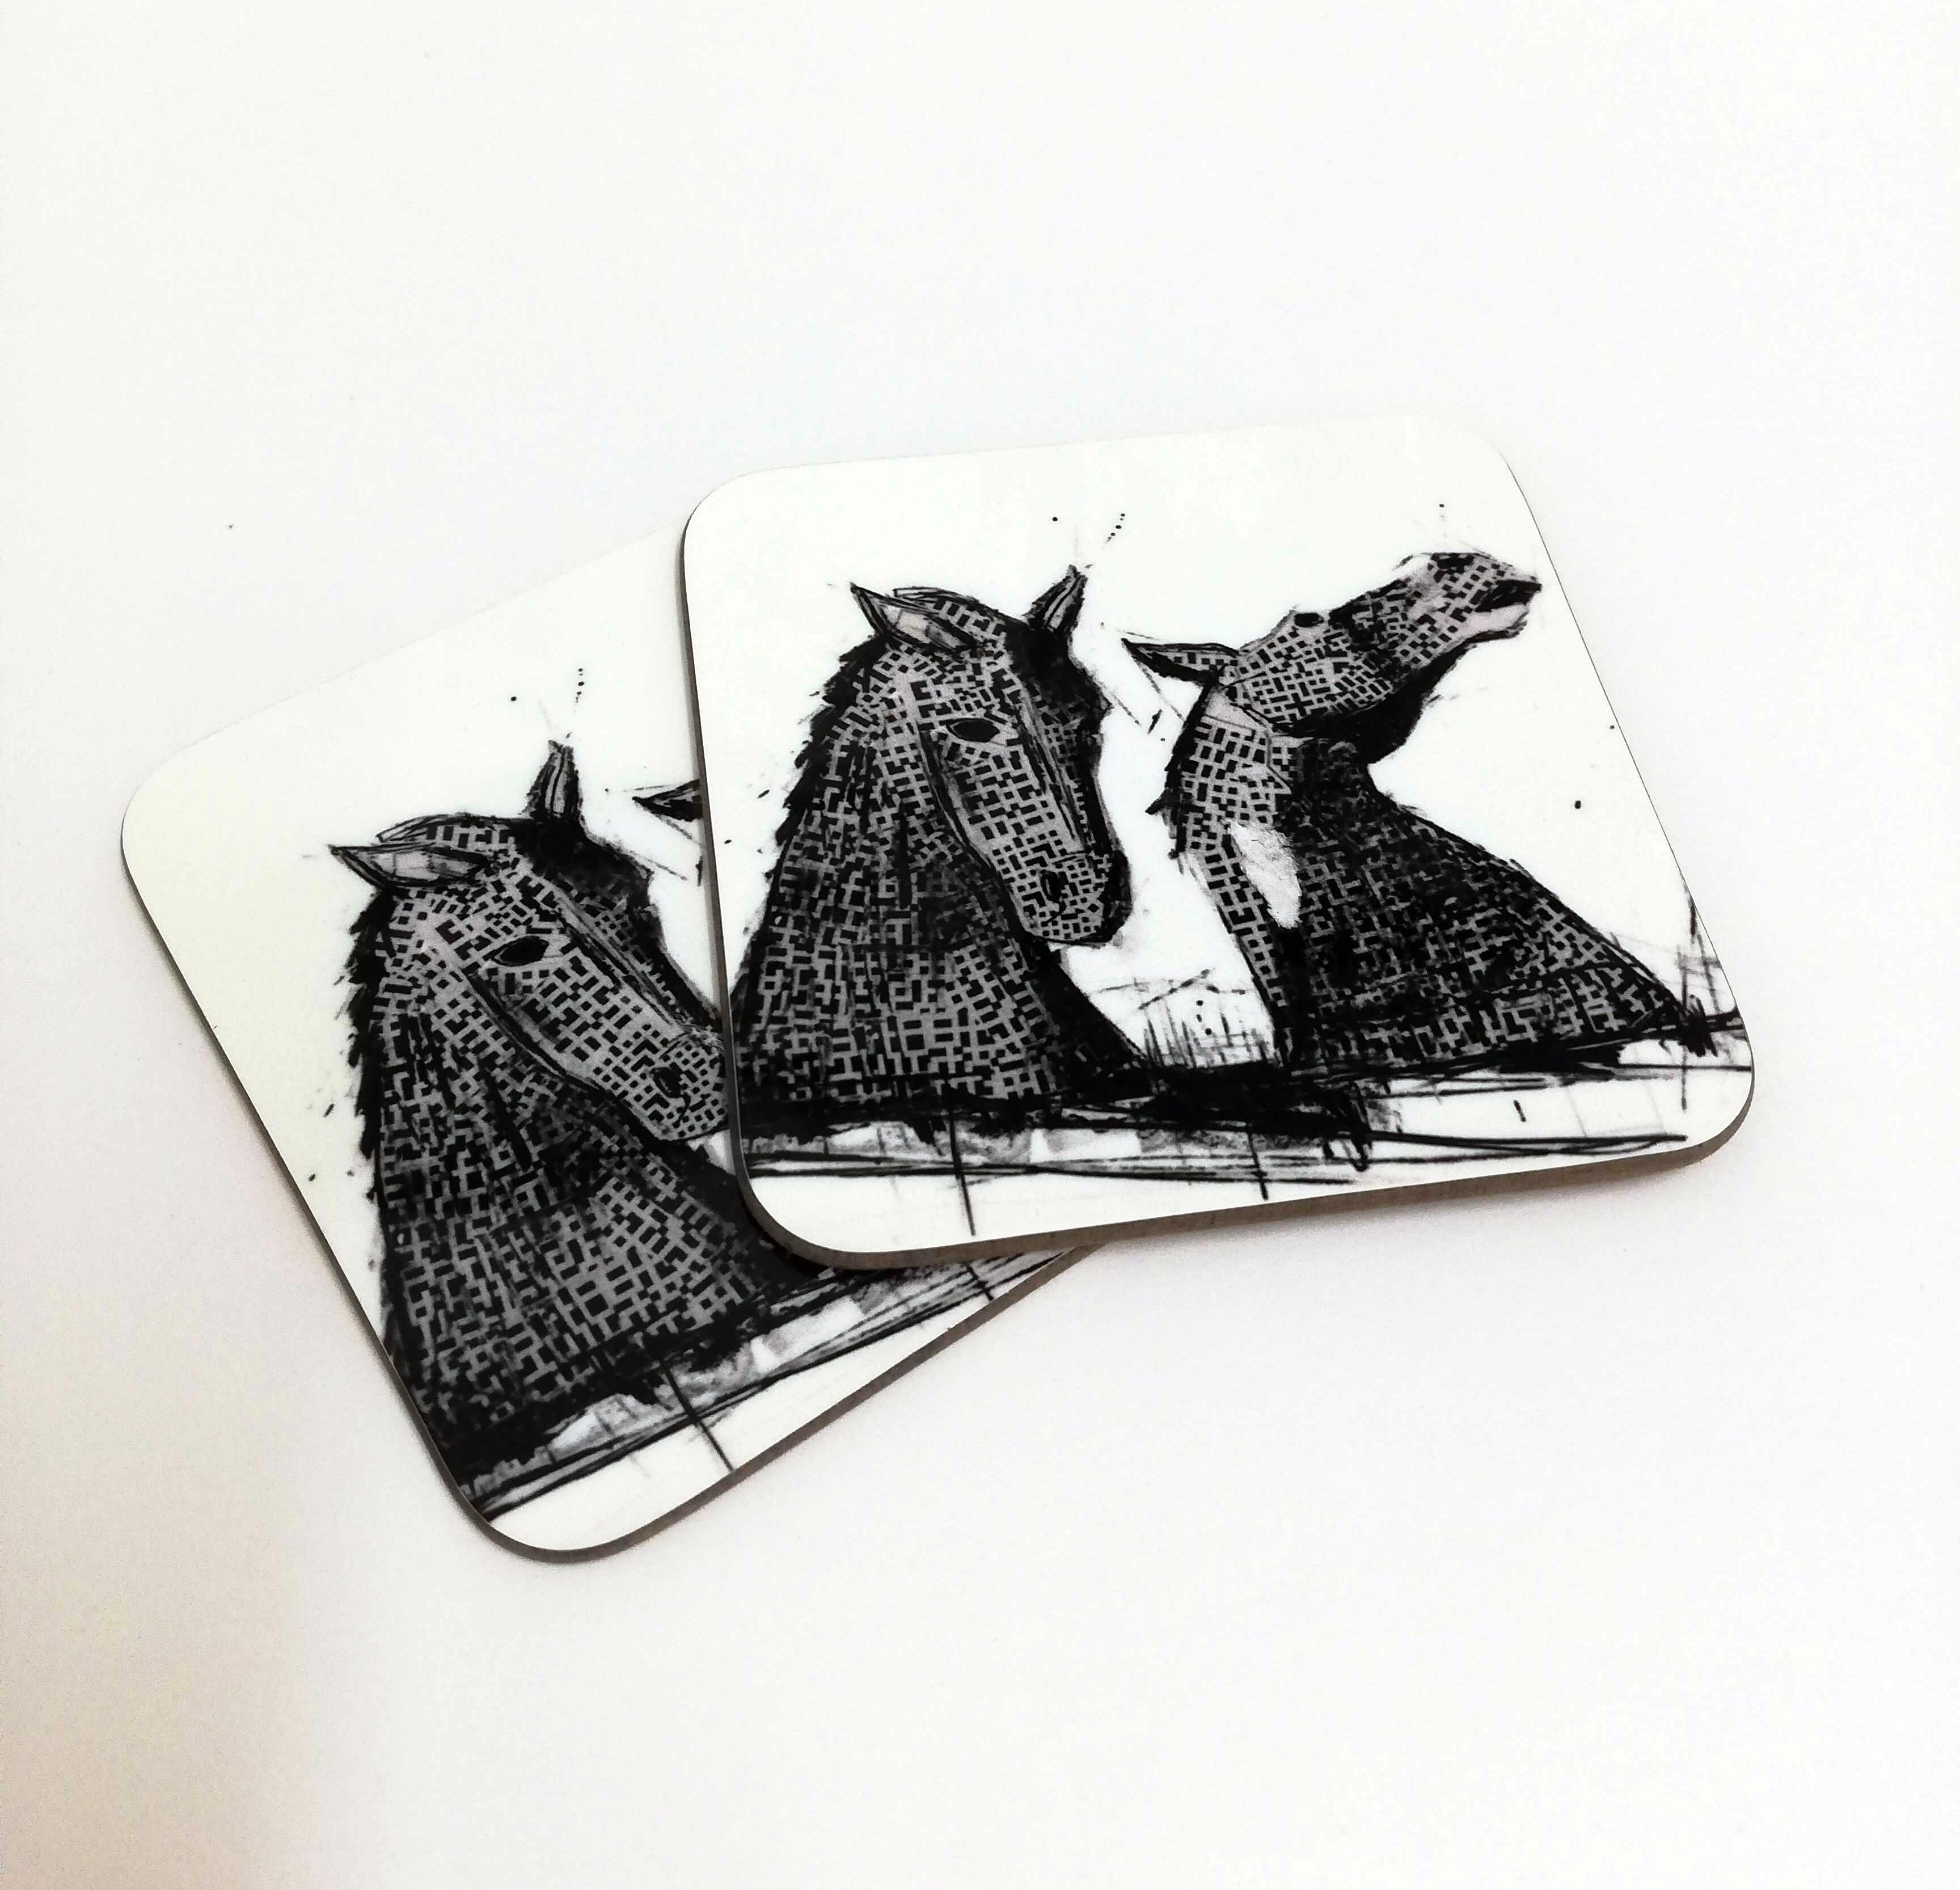 Kelpies Coaster